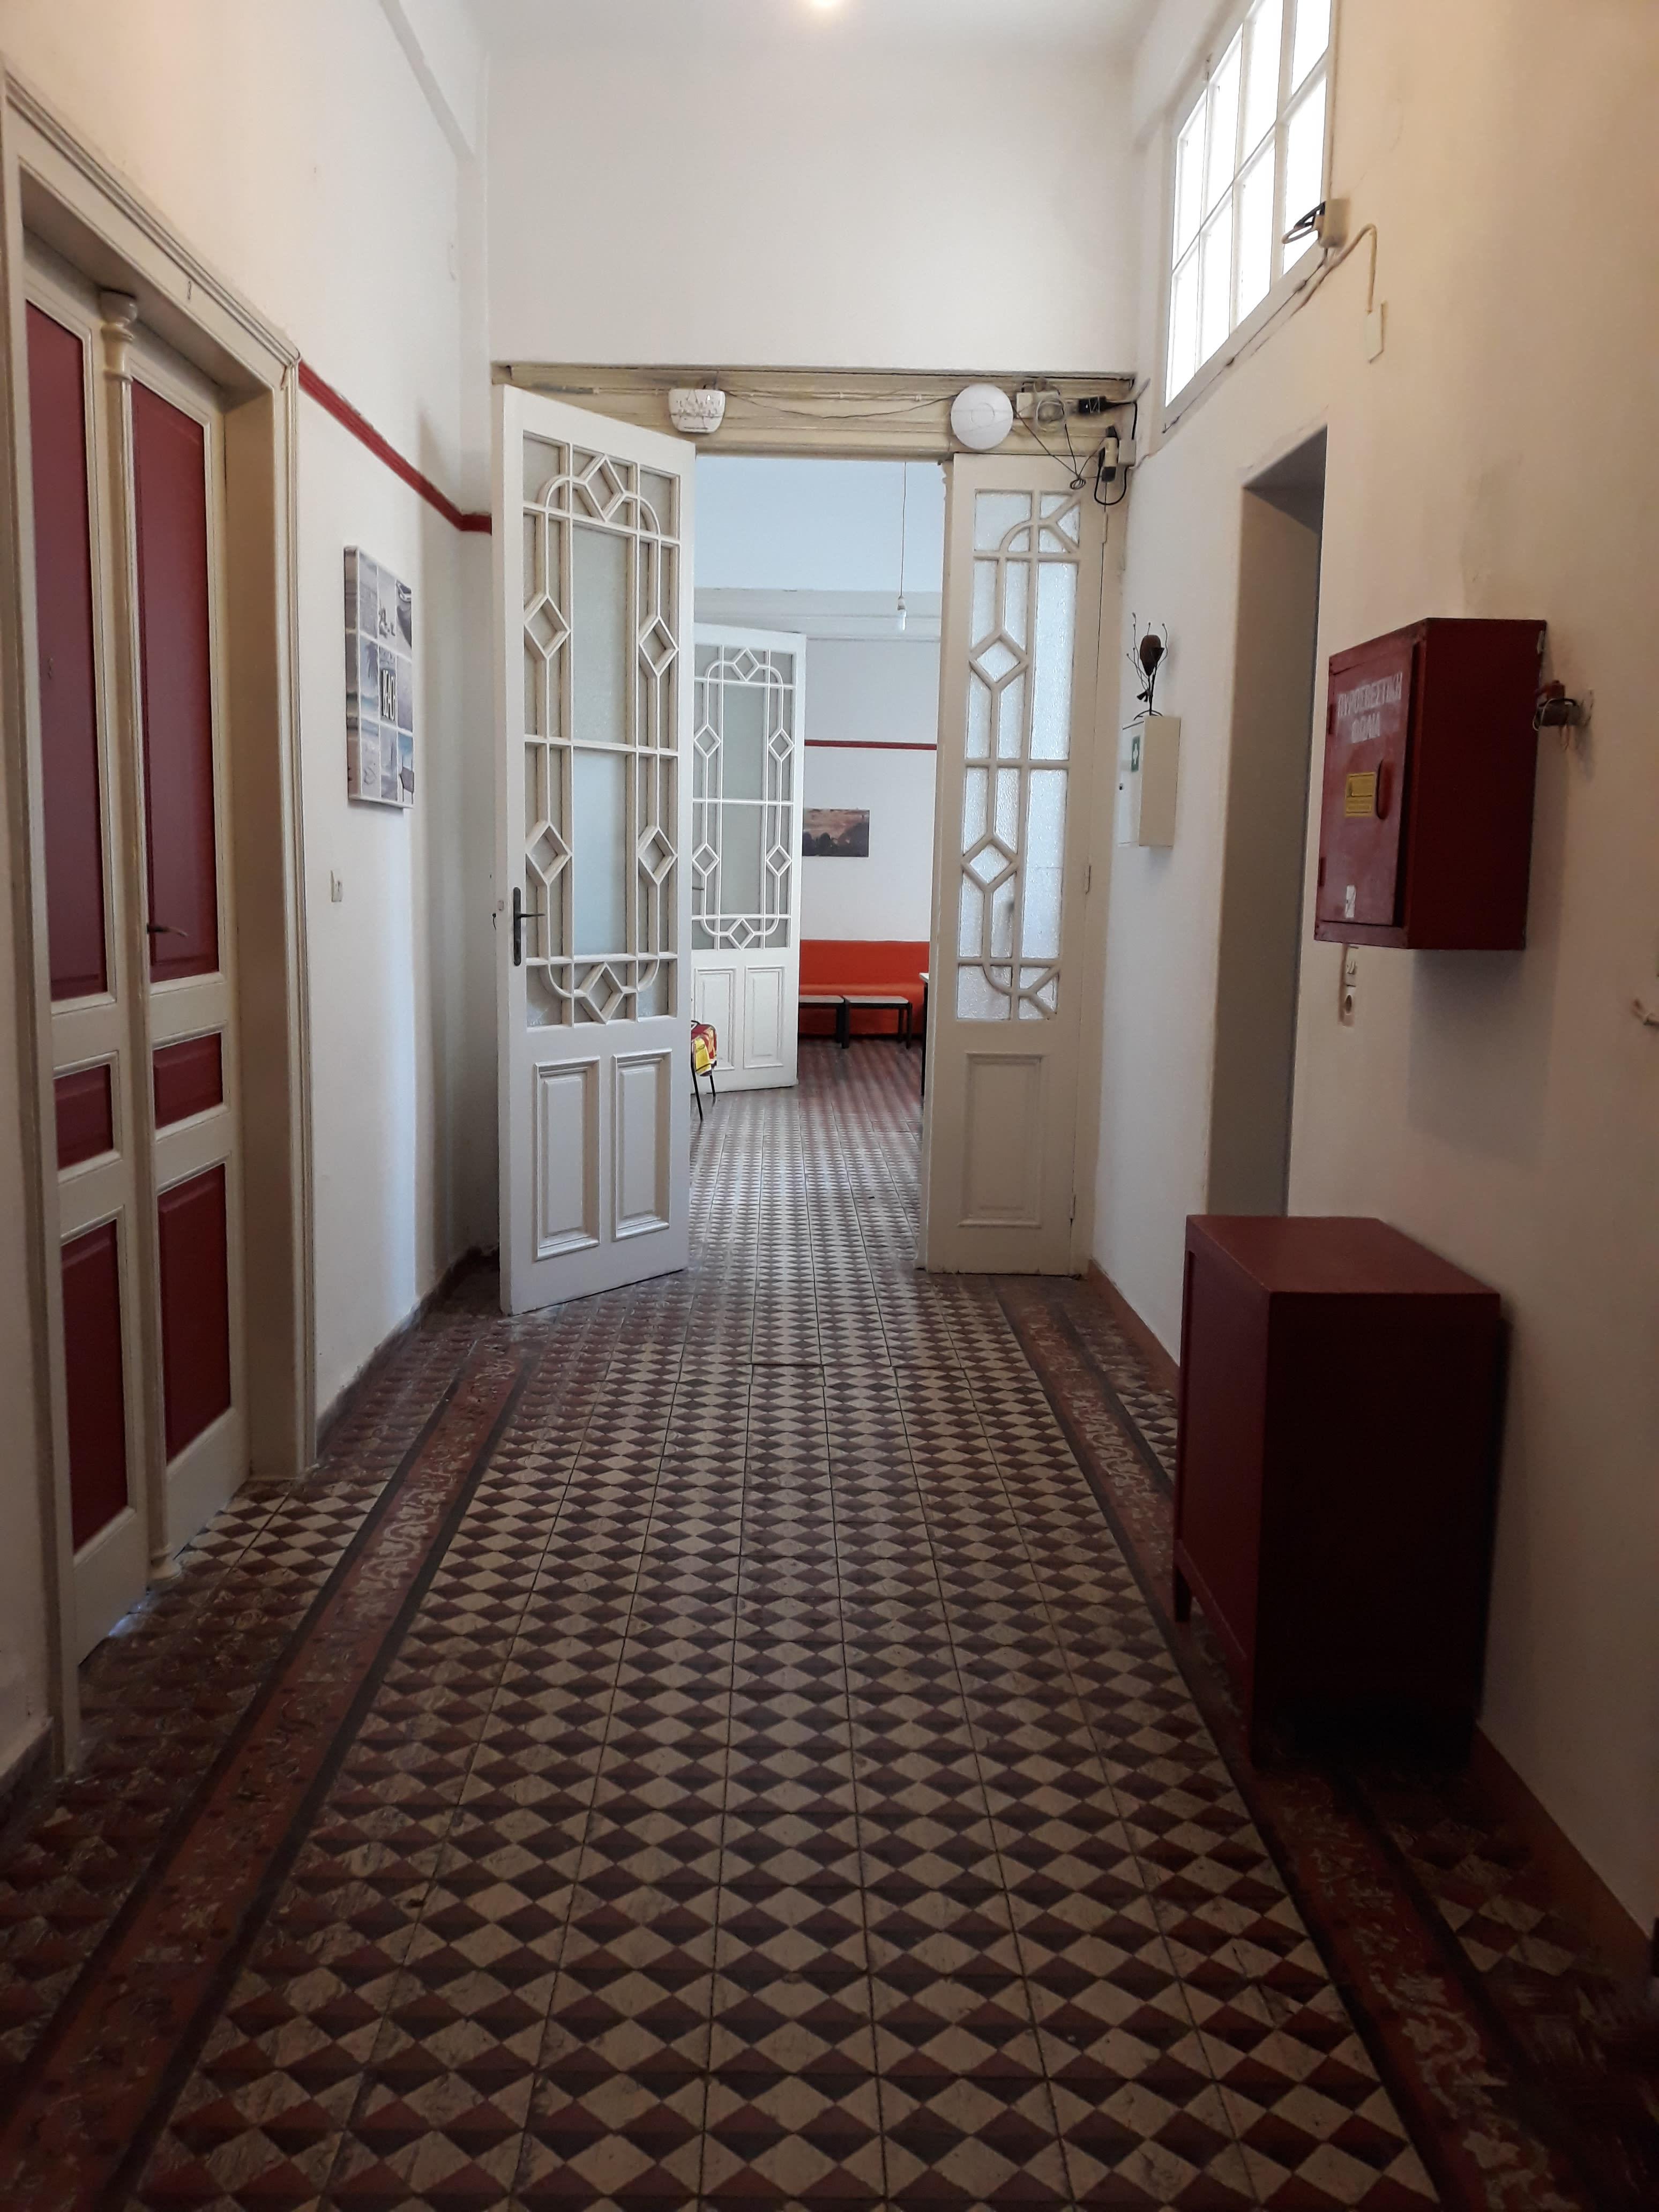 Heraklio Youth Hostel